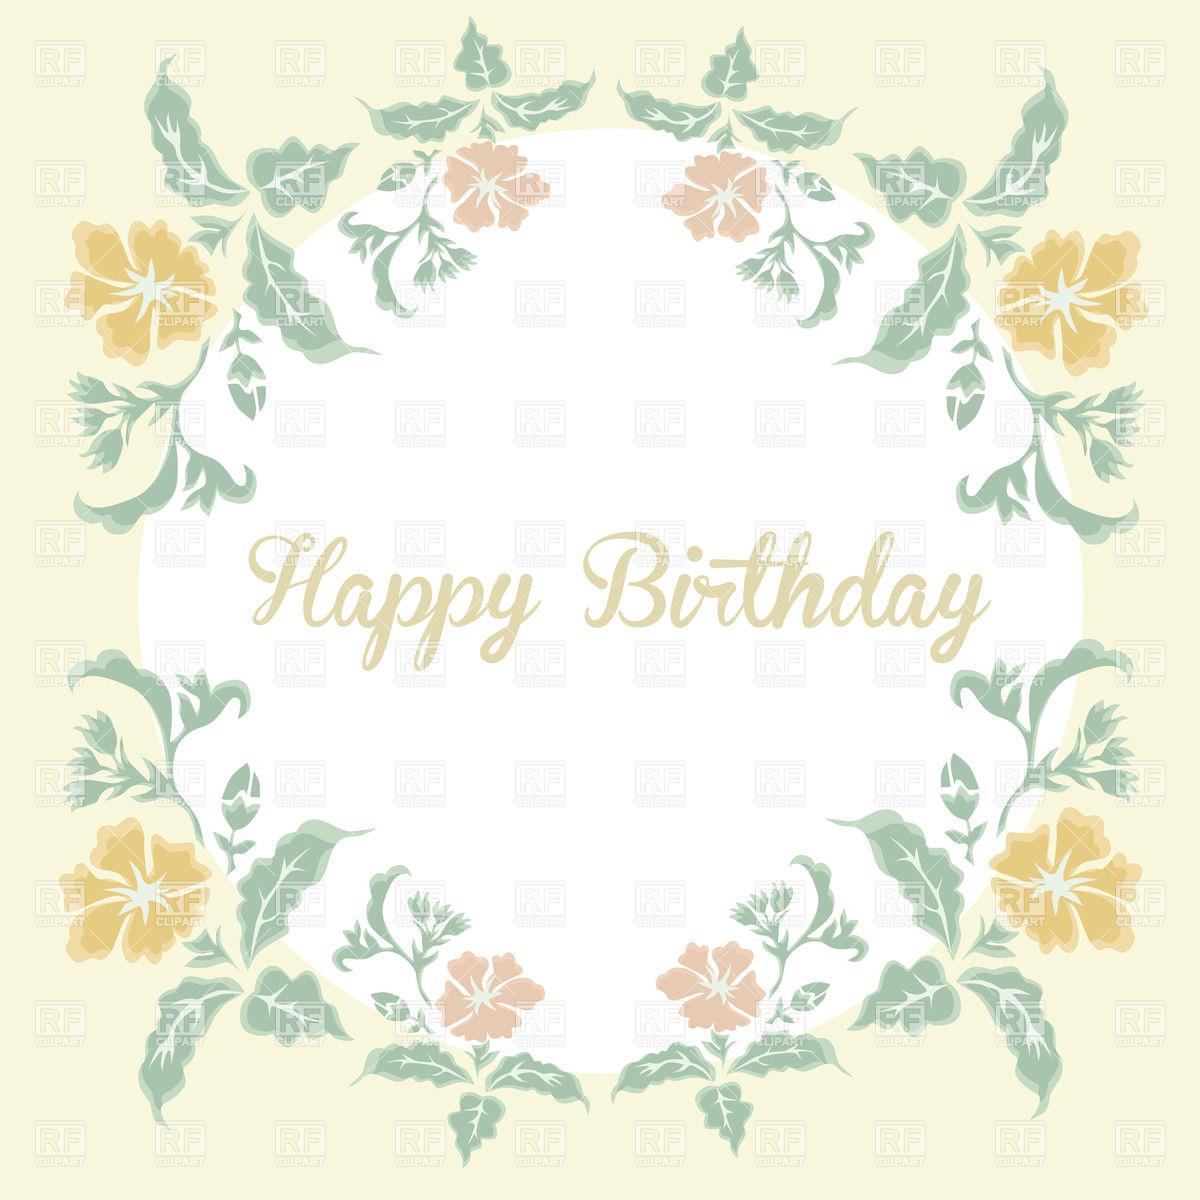 1200x1200 Vintage Floral Card With Inscription Happy Birthday Vector Image